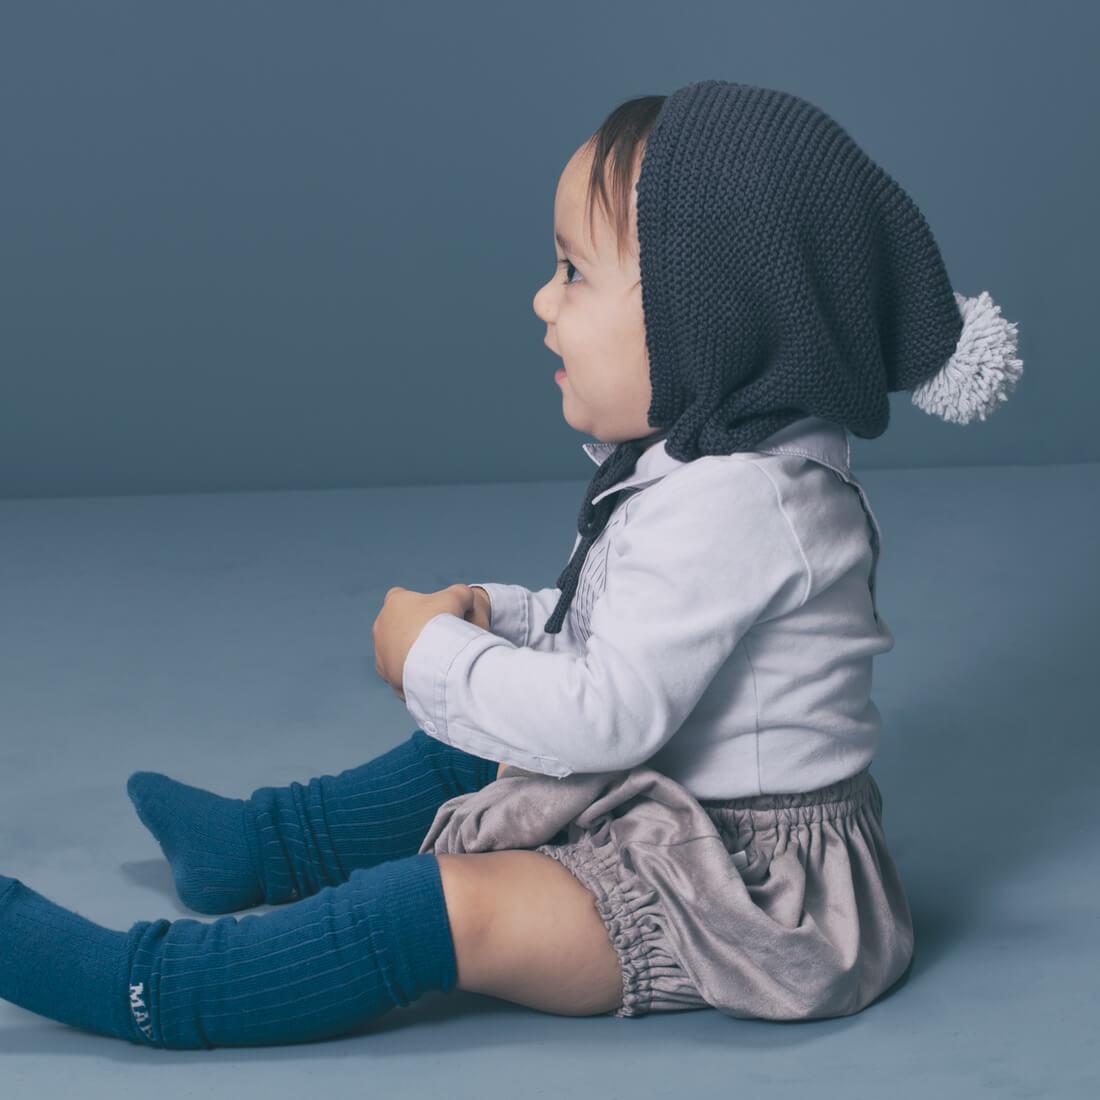 MARLMARL knit bonnet 1 seiji by MARLMARL